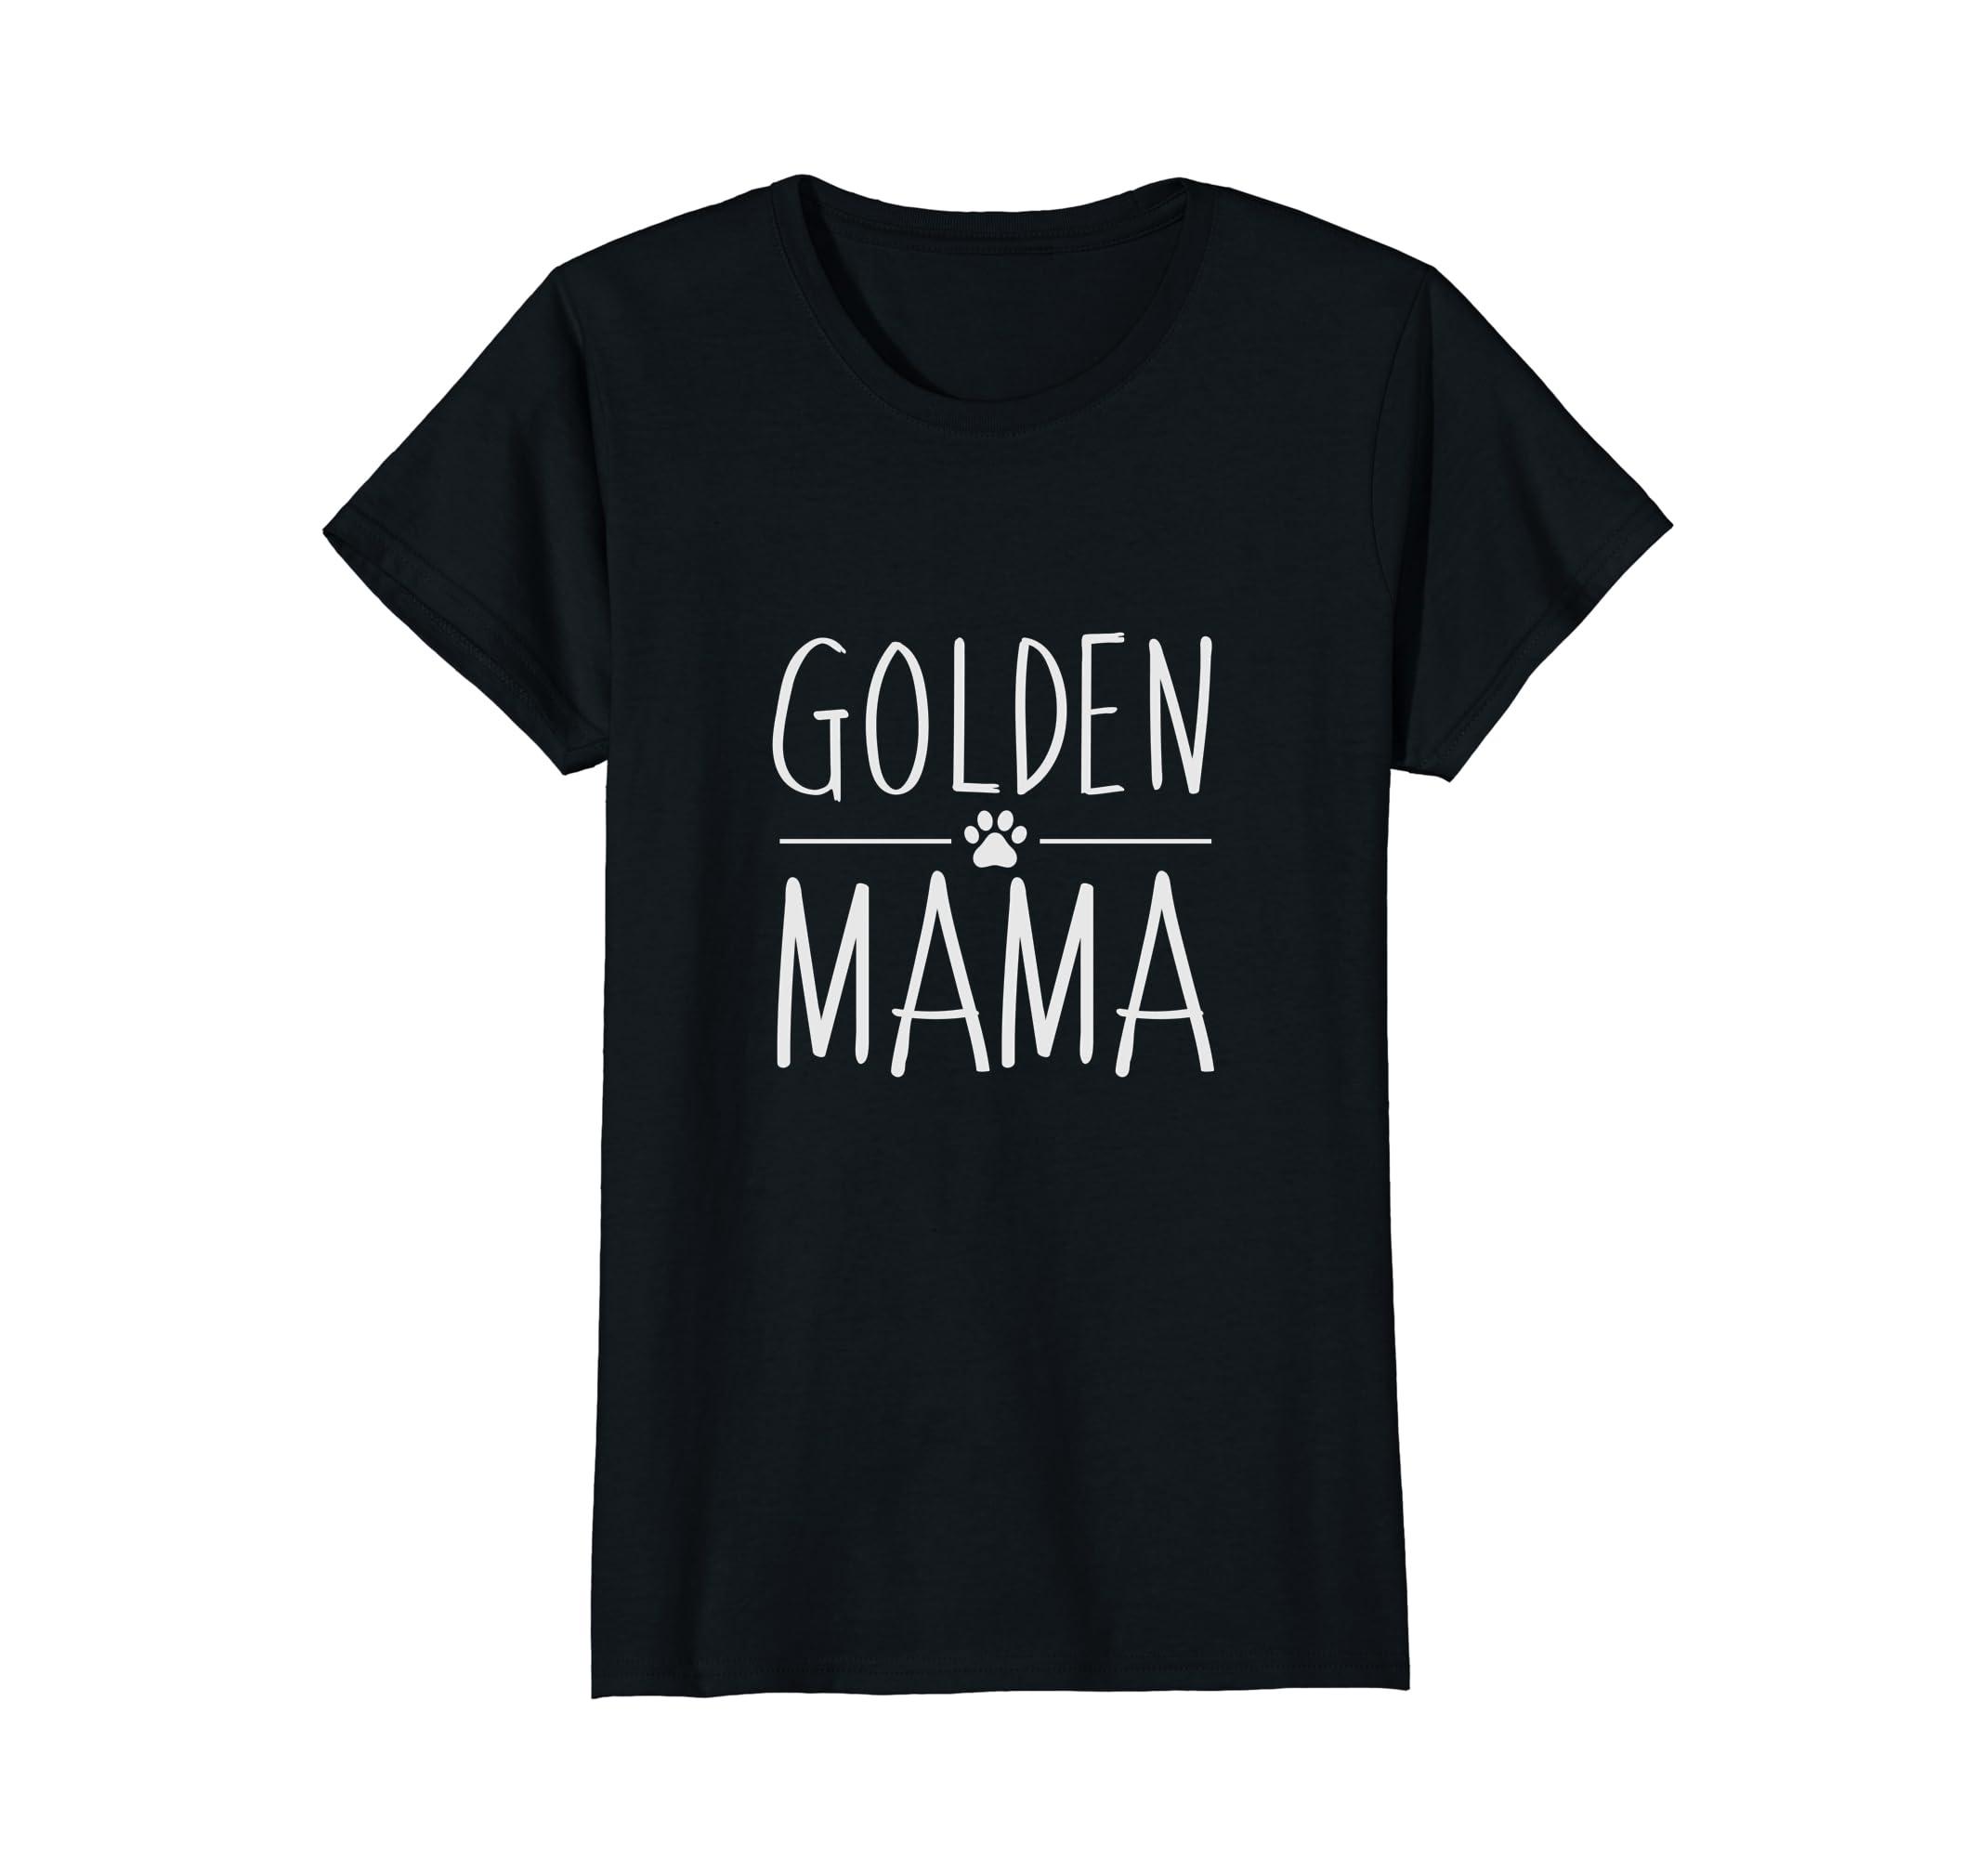 Womens Golden Retriever Mama Graphic Tee | Dog Mom Shirts for Women-AZP